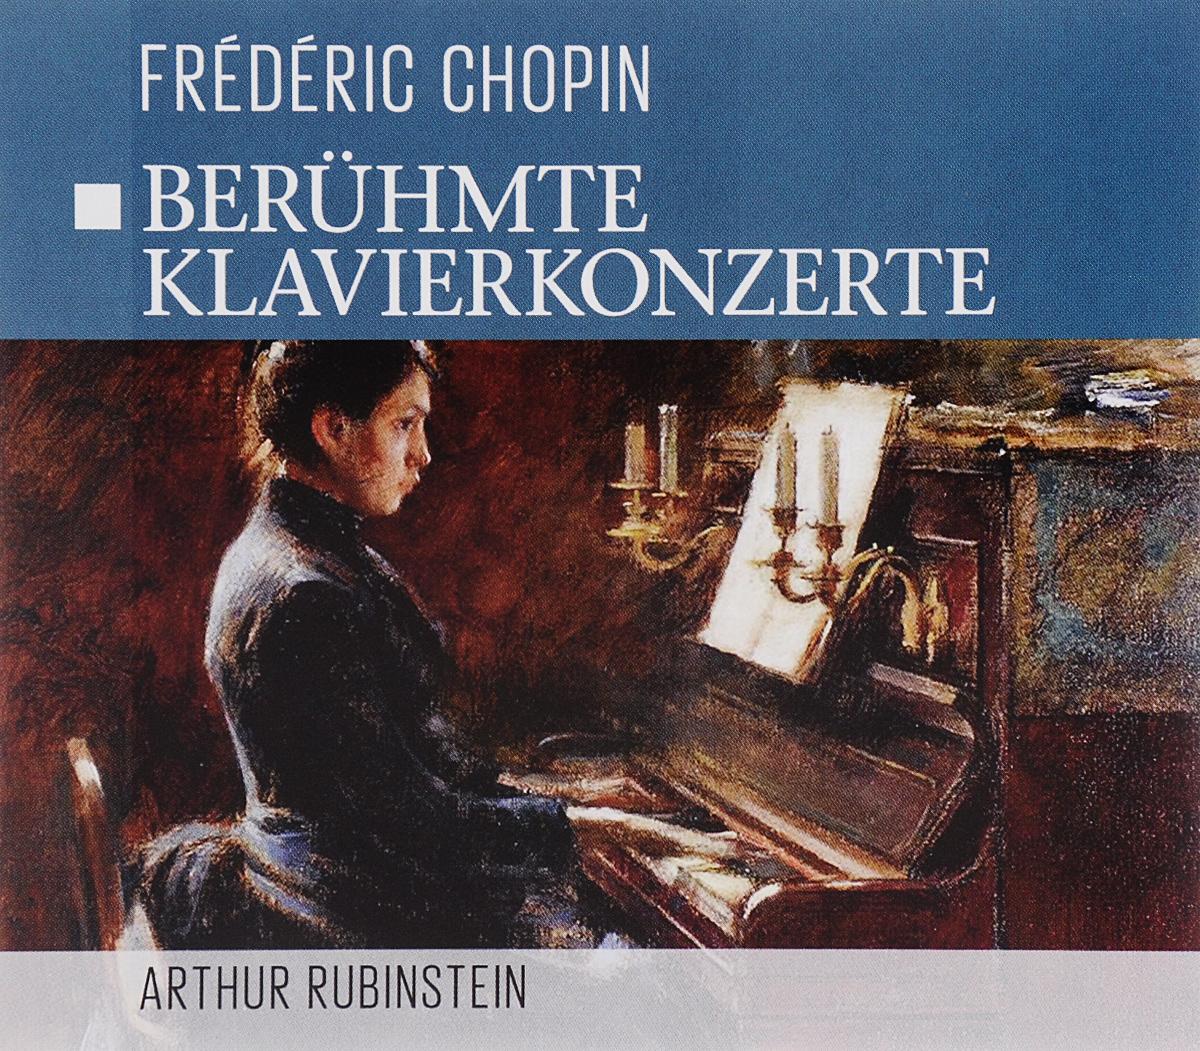 Arthur Rubinstein  Frederic Chopin  Beruhmte Klavierkonzert